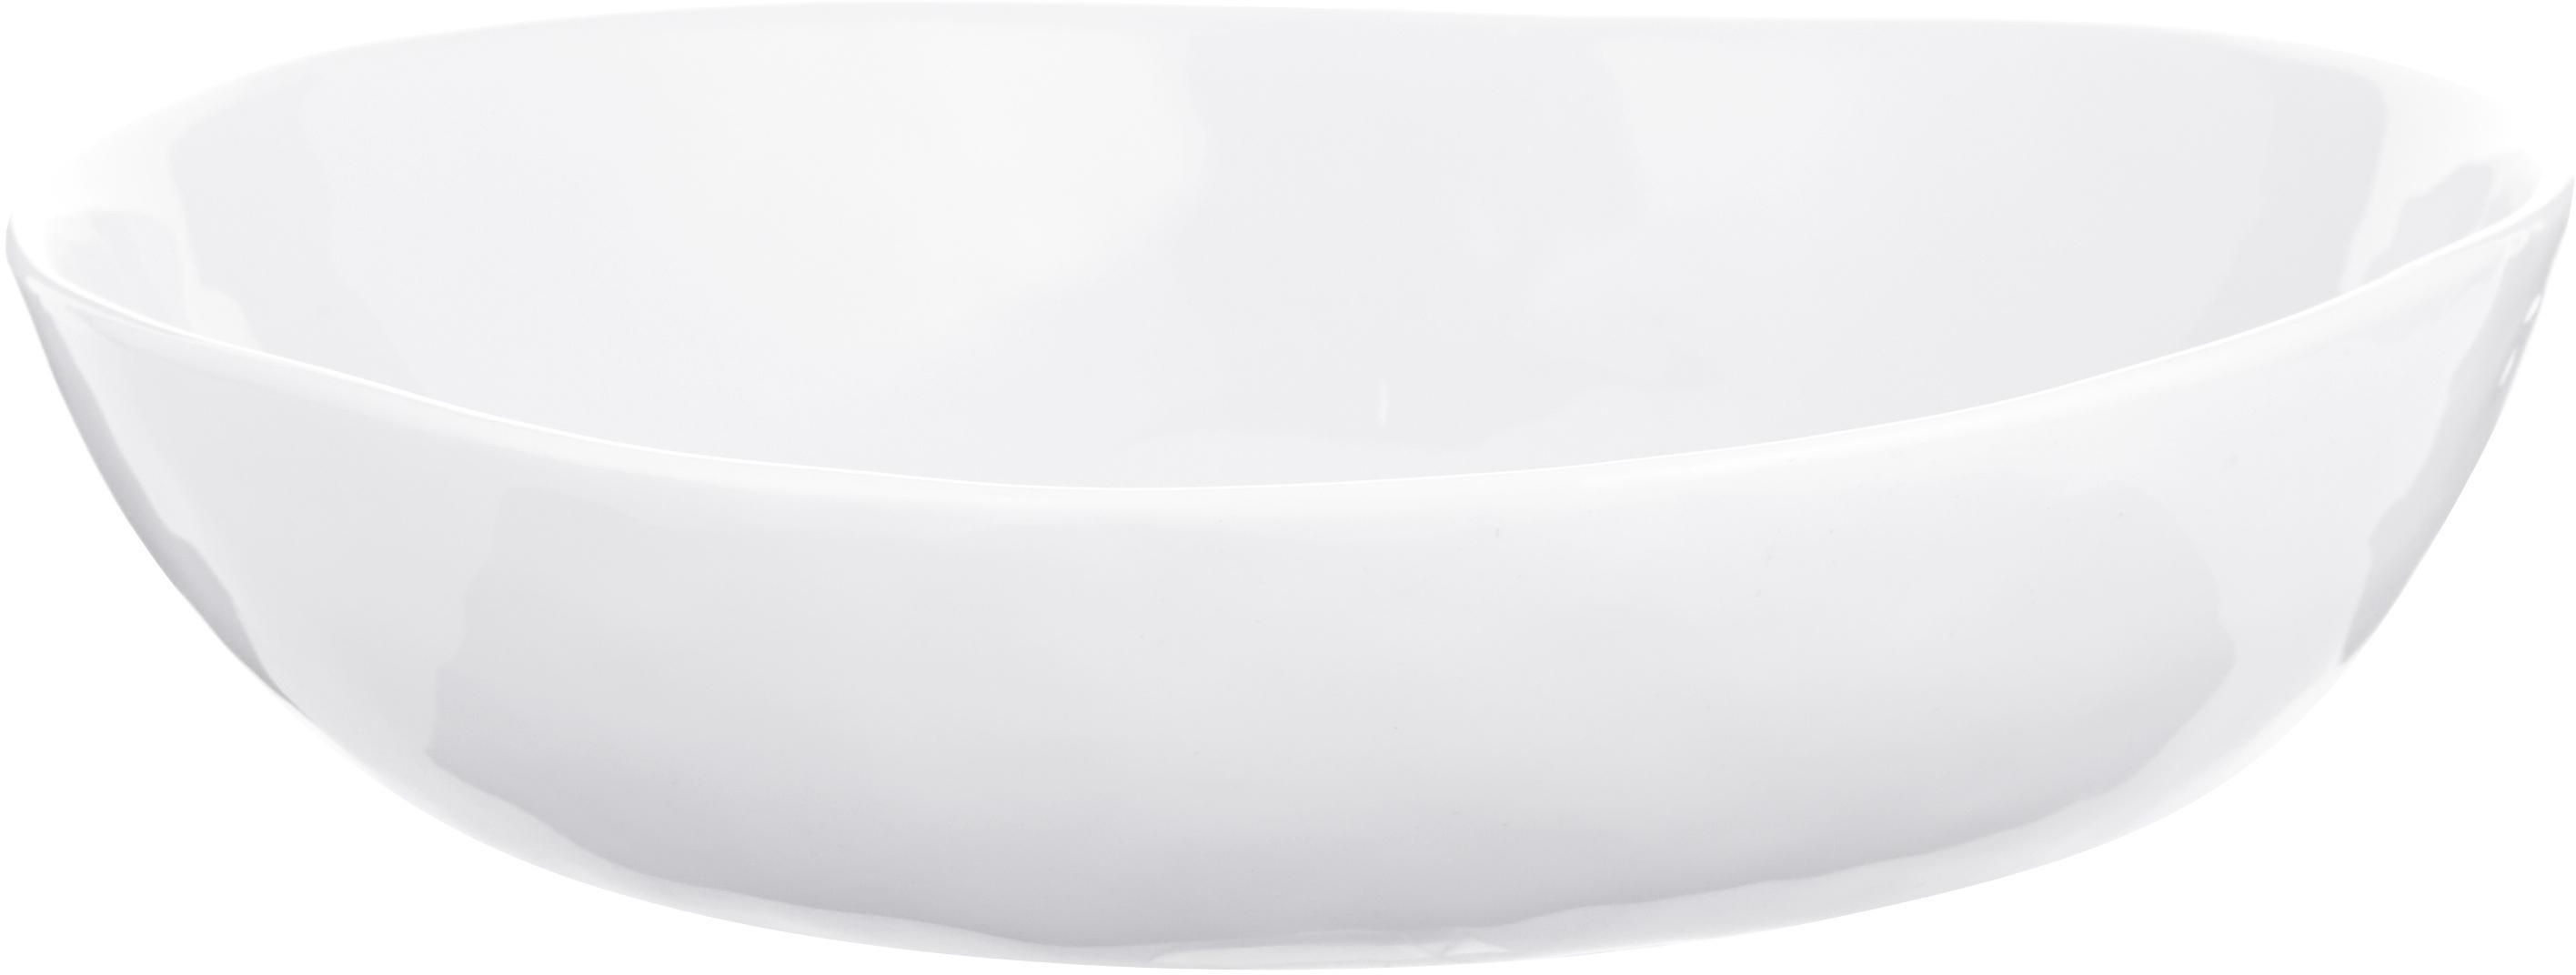 Ciotola Porcelino con superficie irregolare 4 pz, Porcellana, volutamente irregolare, Bianco, Lung. 17 x Larg. 16 cm